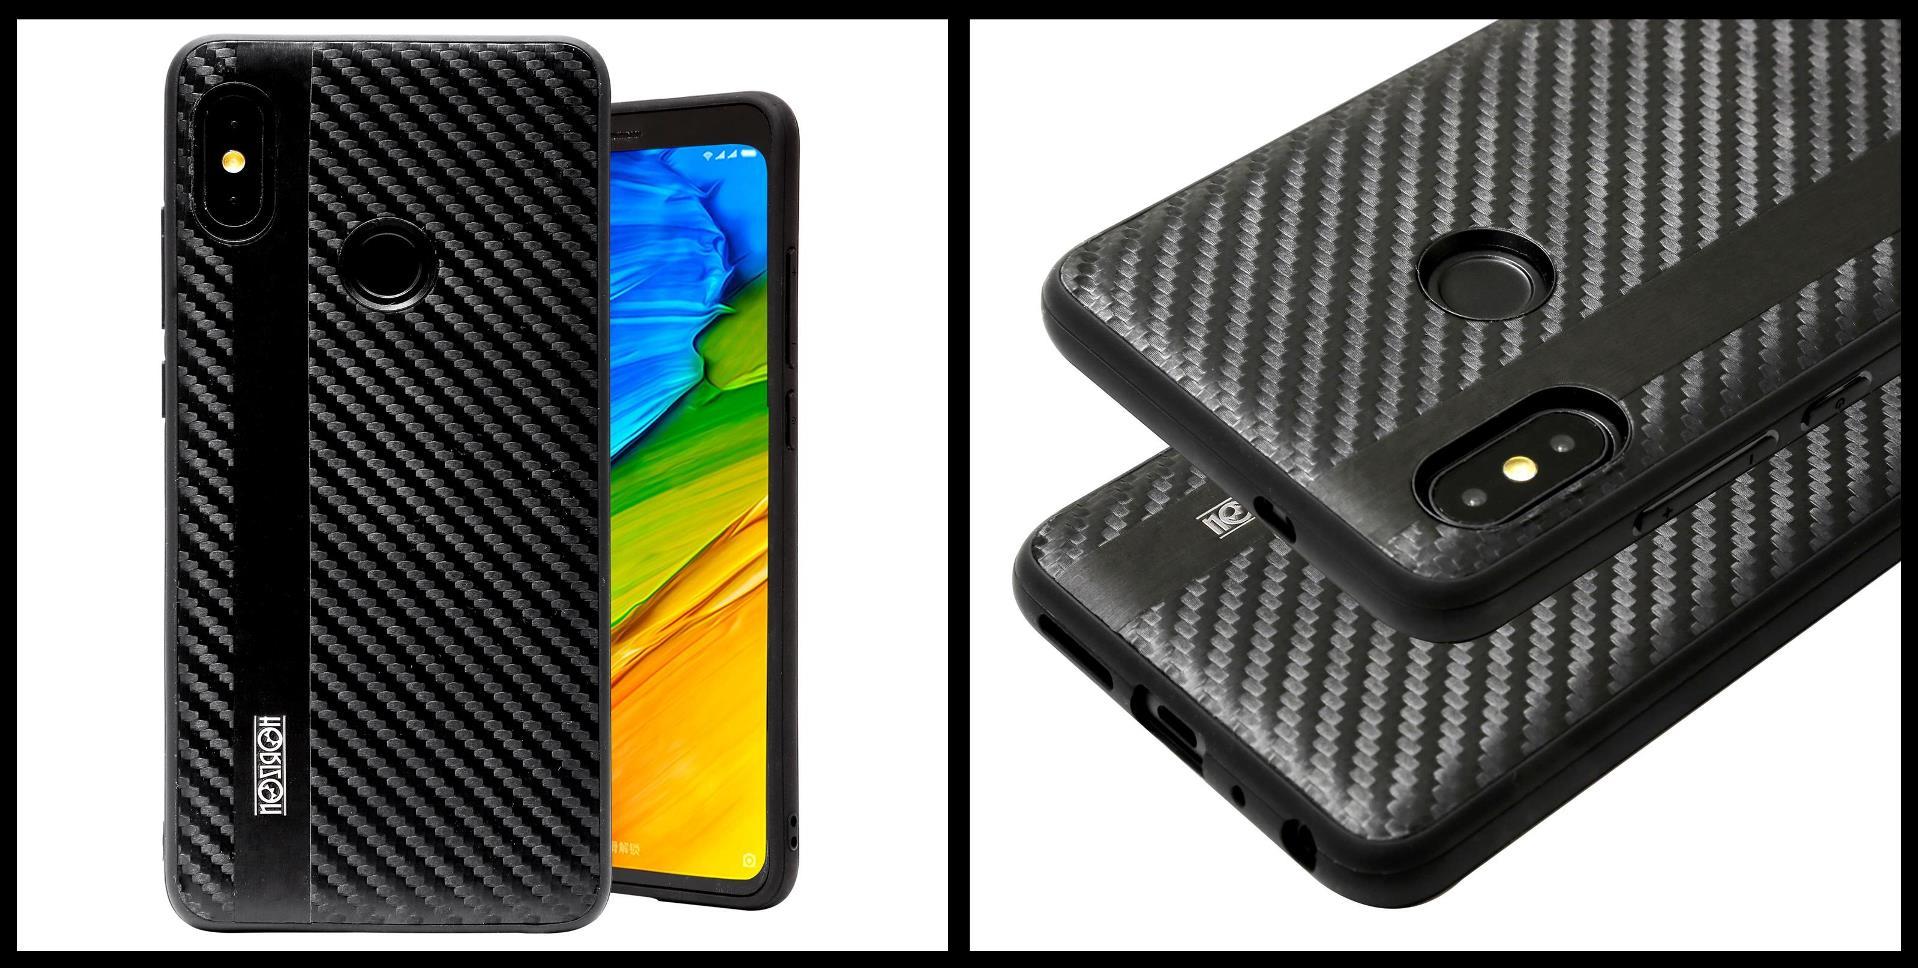 noziroh-carbon-xiaomi-redmi-note-5-pro-cover-case-shockproof-dark-design-black